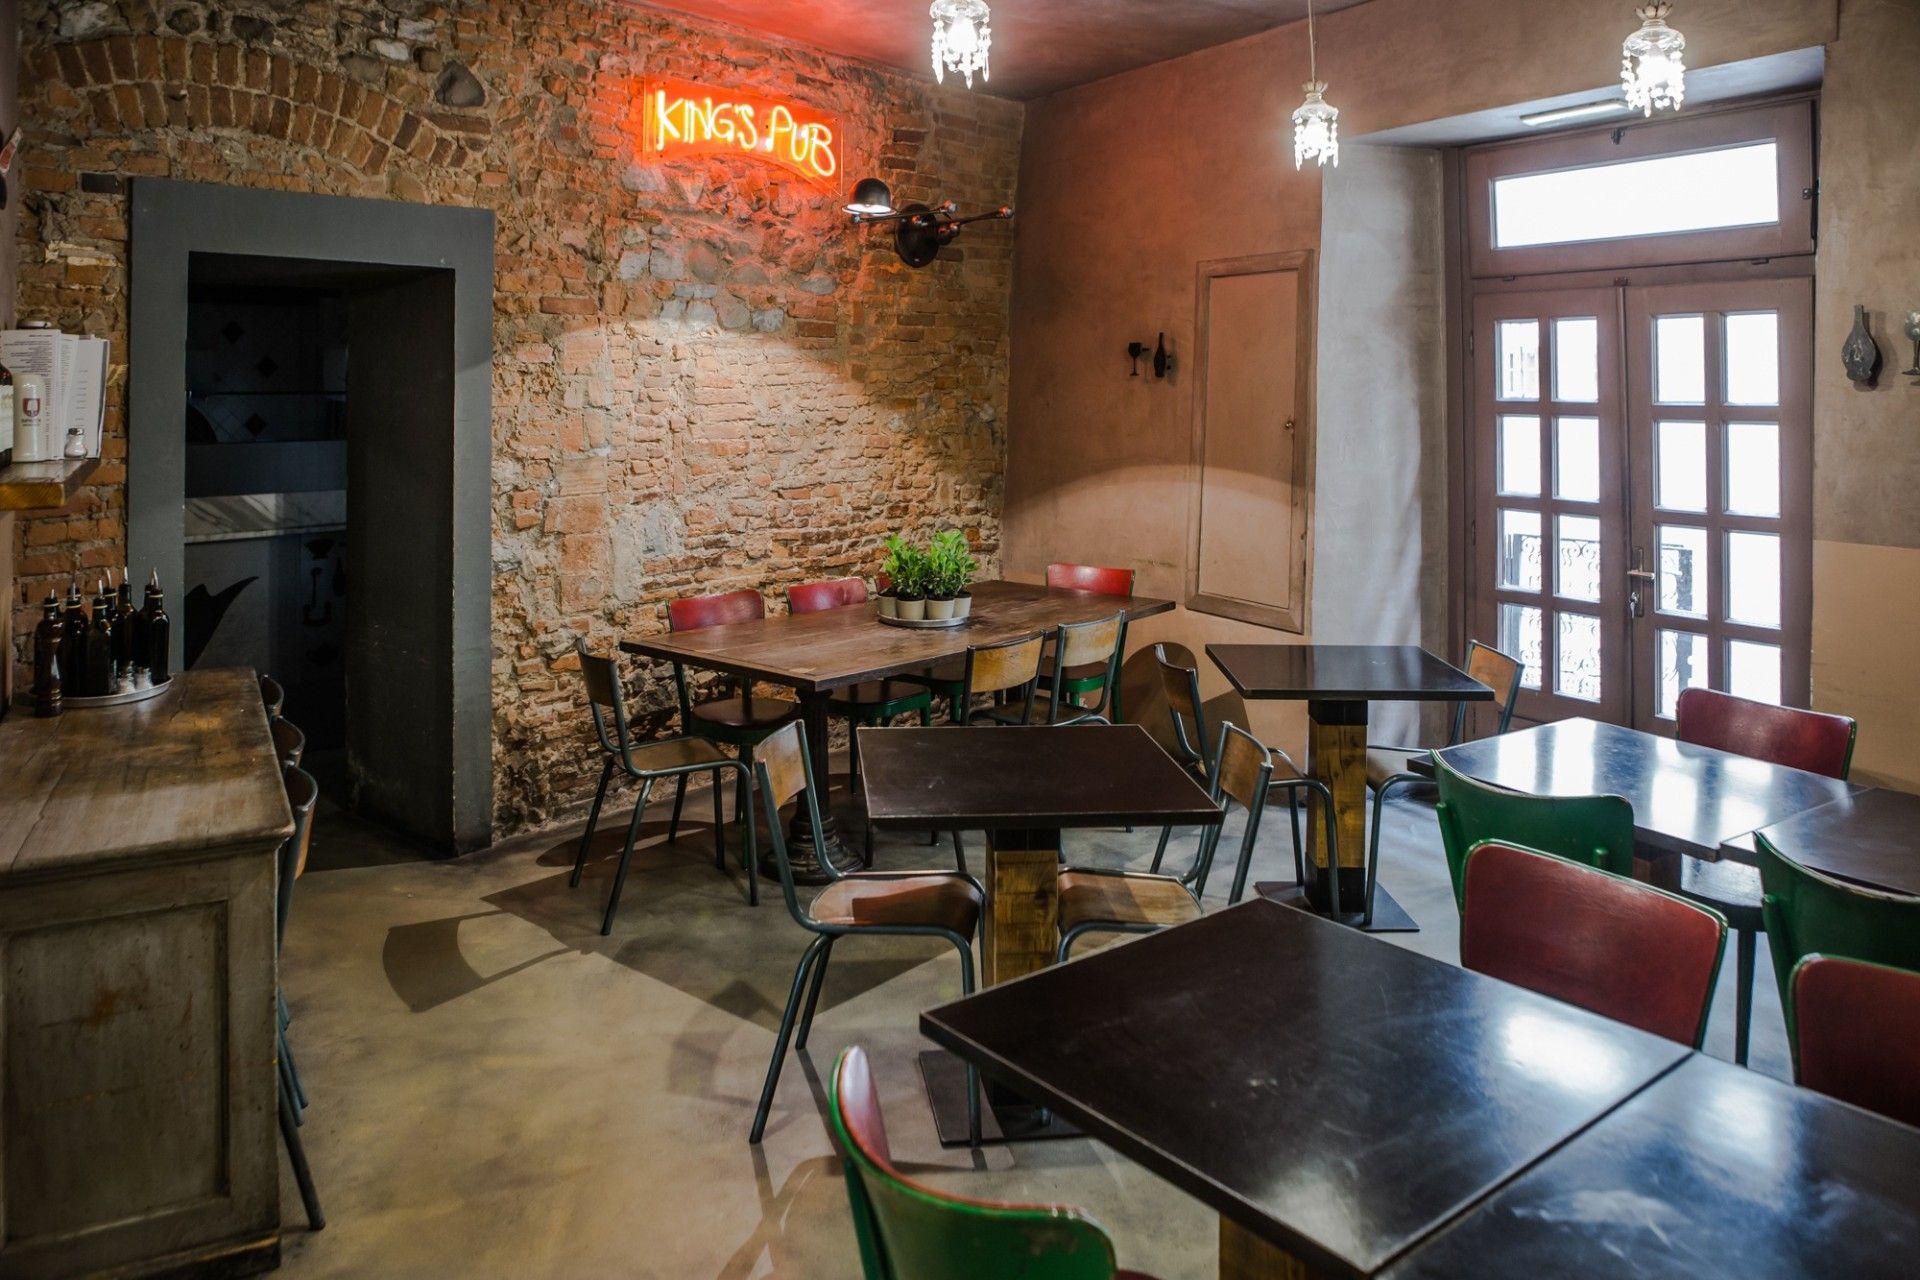 www.tribecafactory.it #tribecafactory #restaurantinterior #restaurantdesign